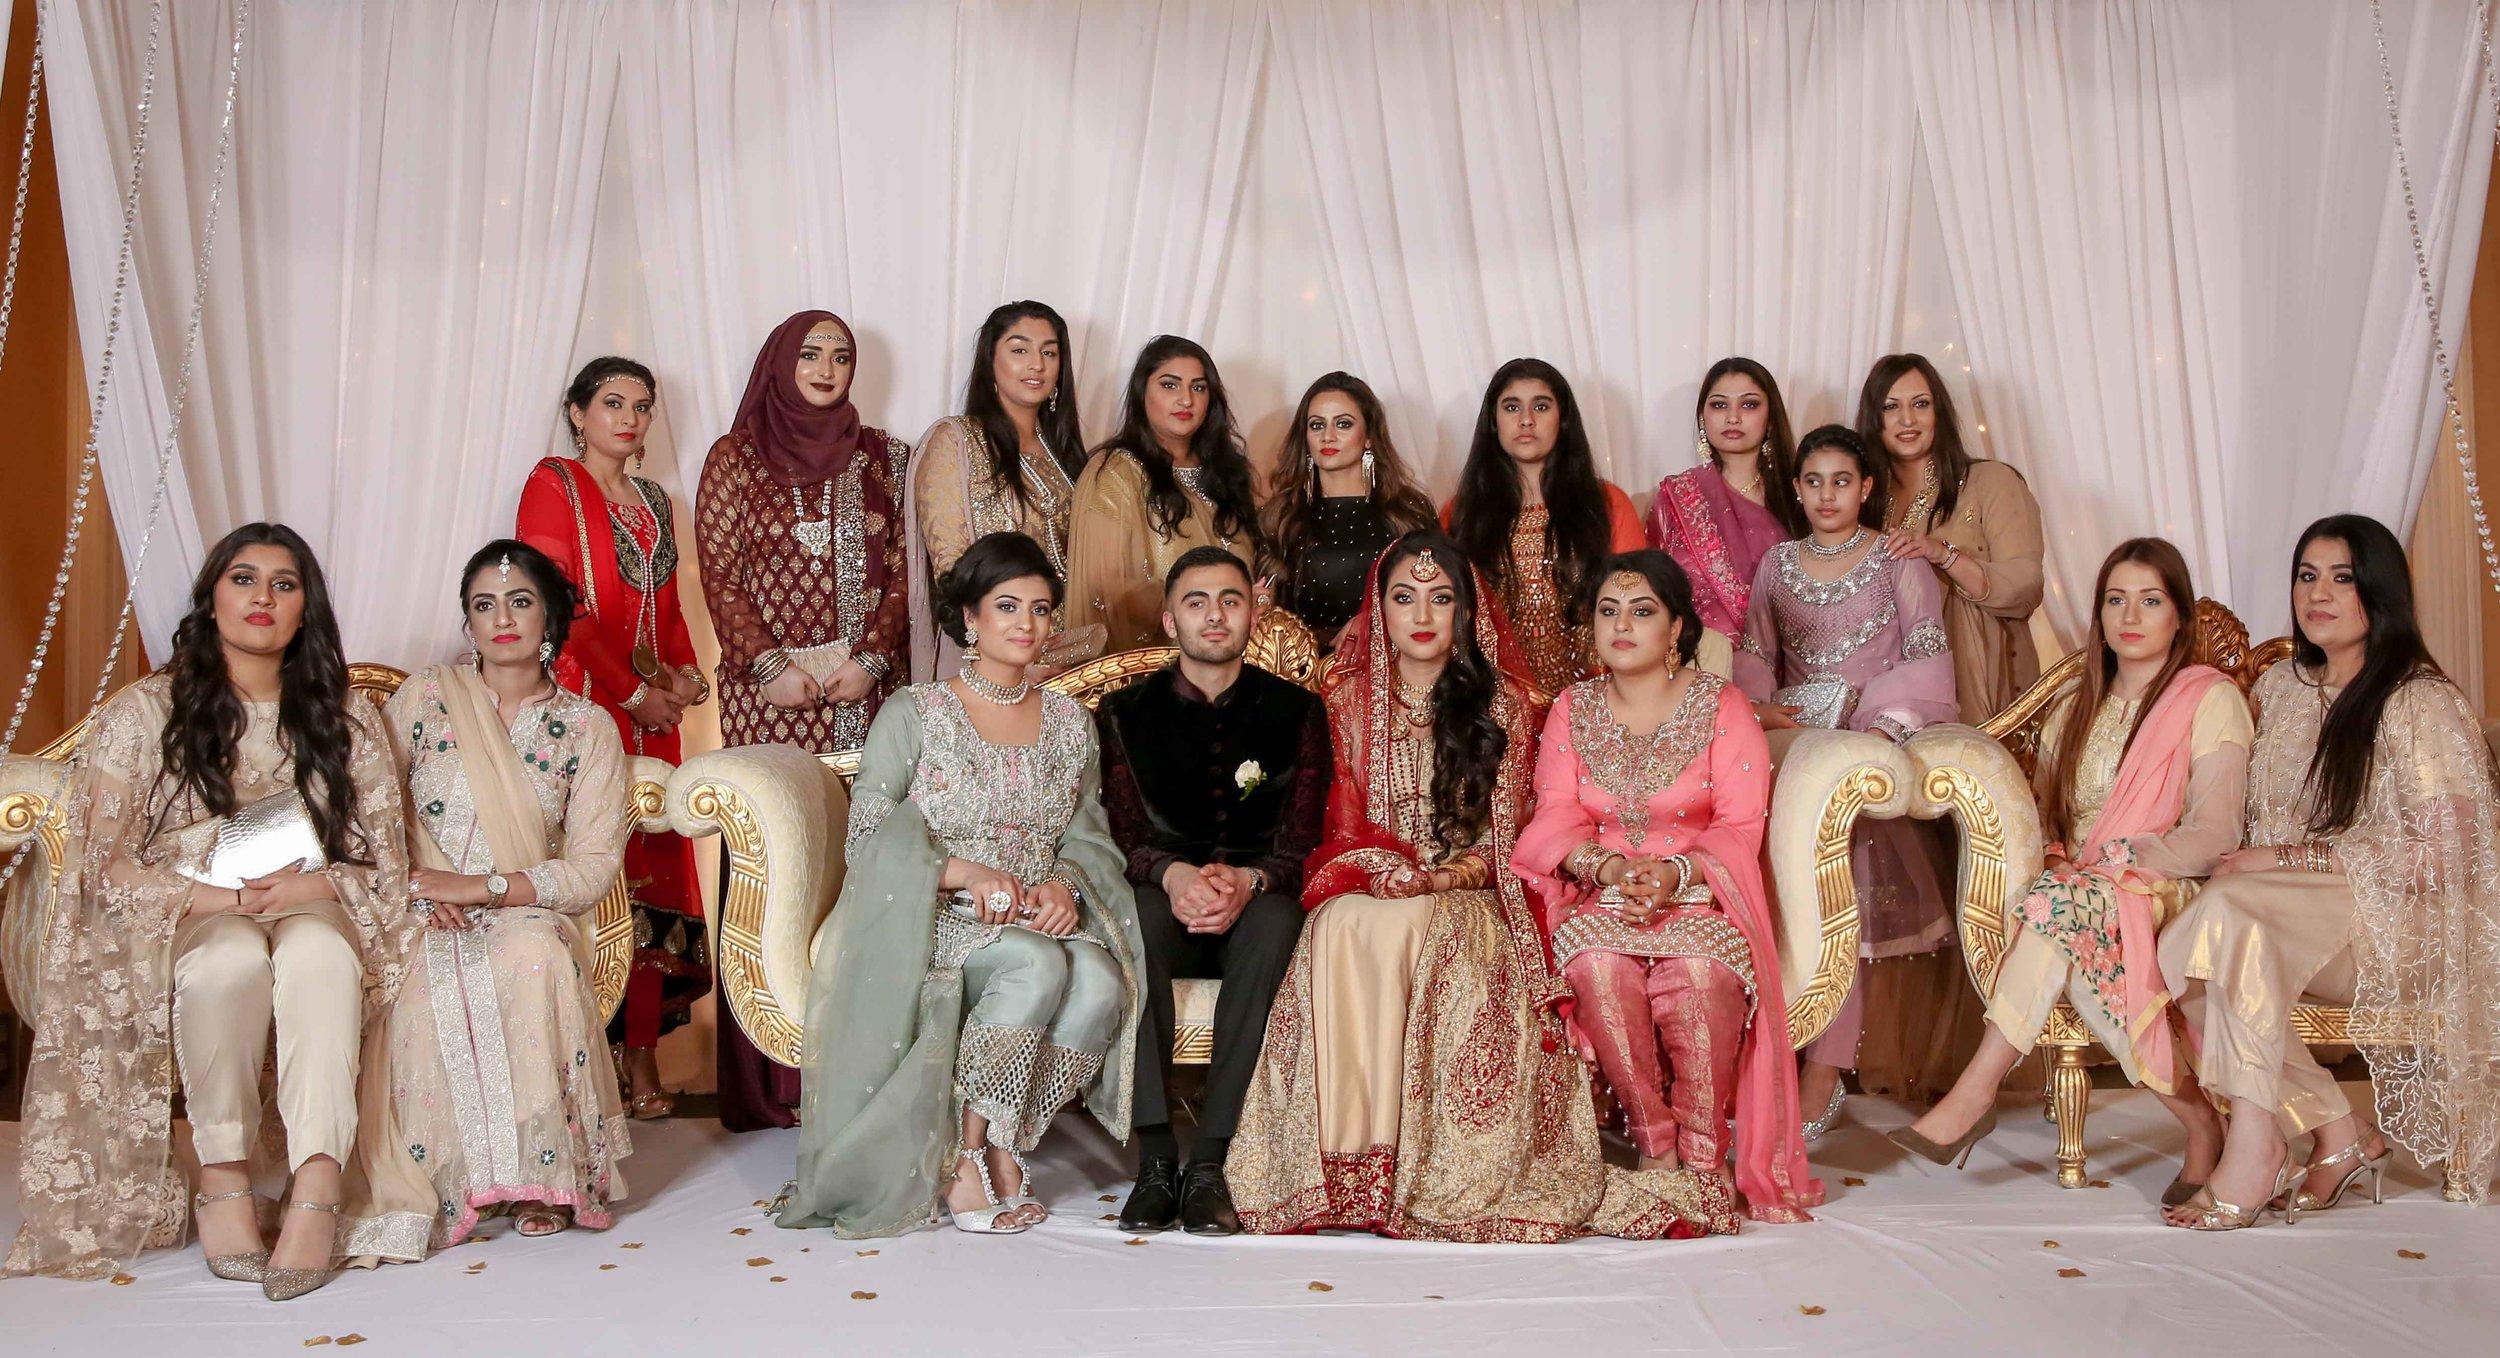 Female-asian-wedding-photographer-Cardiff-City-Hall-natalia-smith-photography-46.jpg